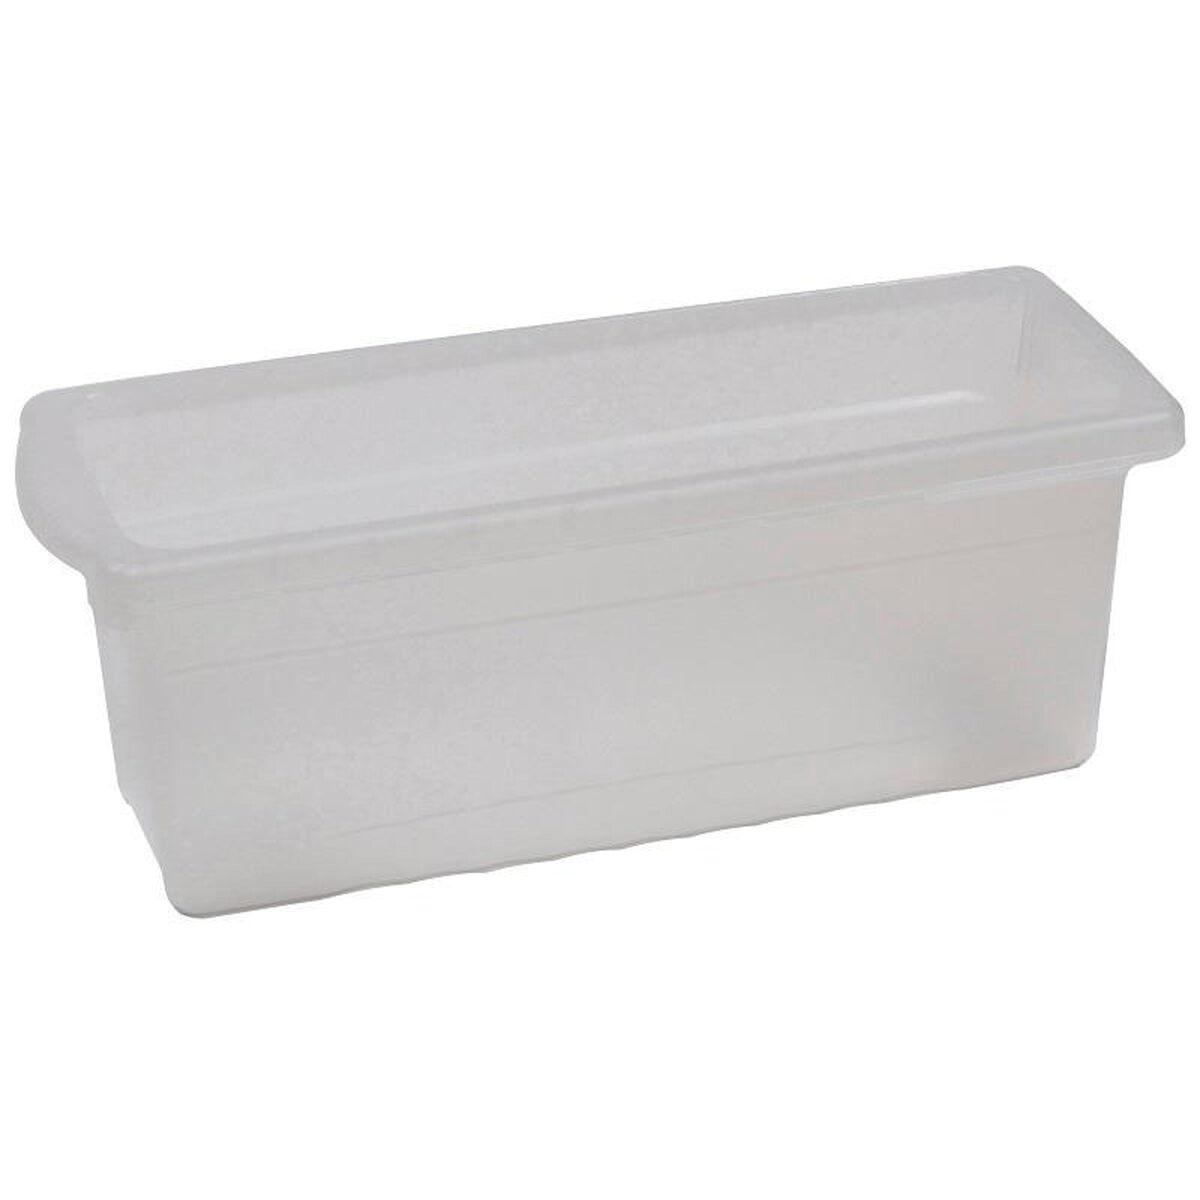 Small Clear Plastic Tub CC4070-C   Bizchair.com